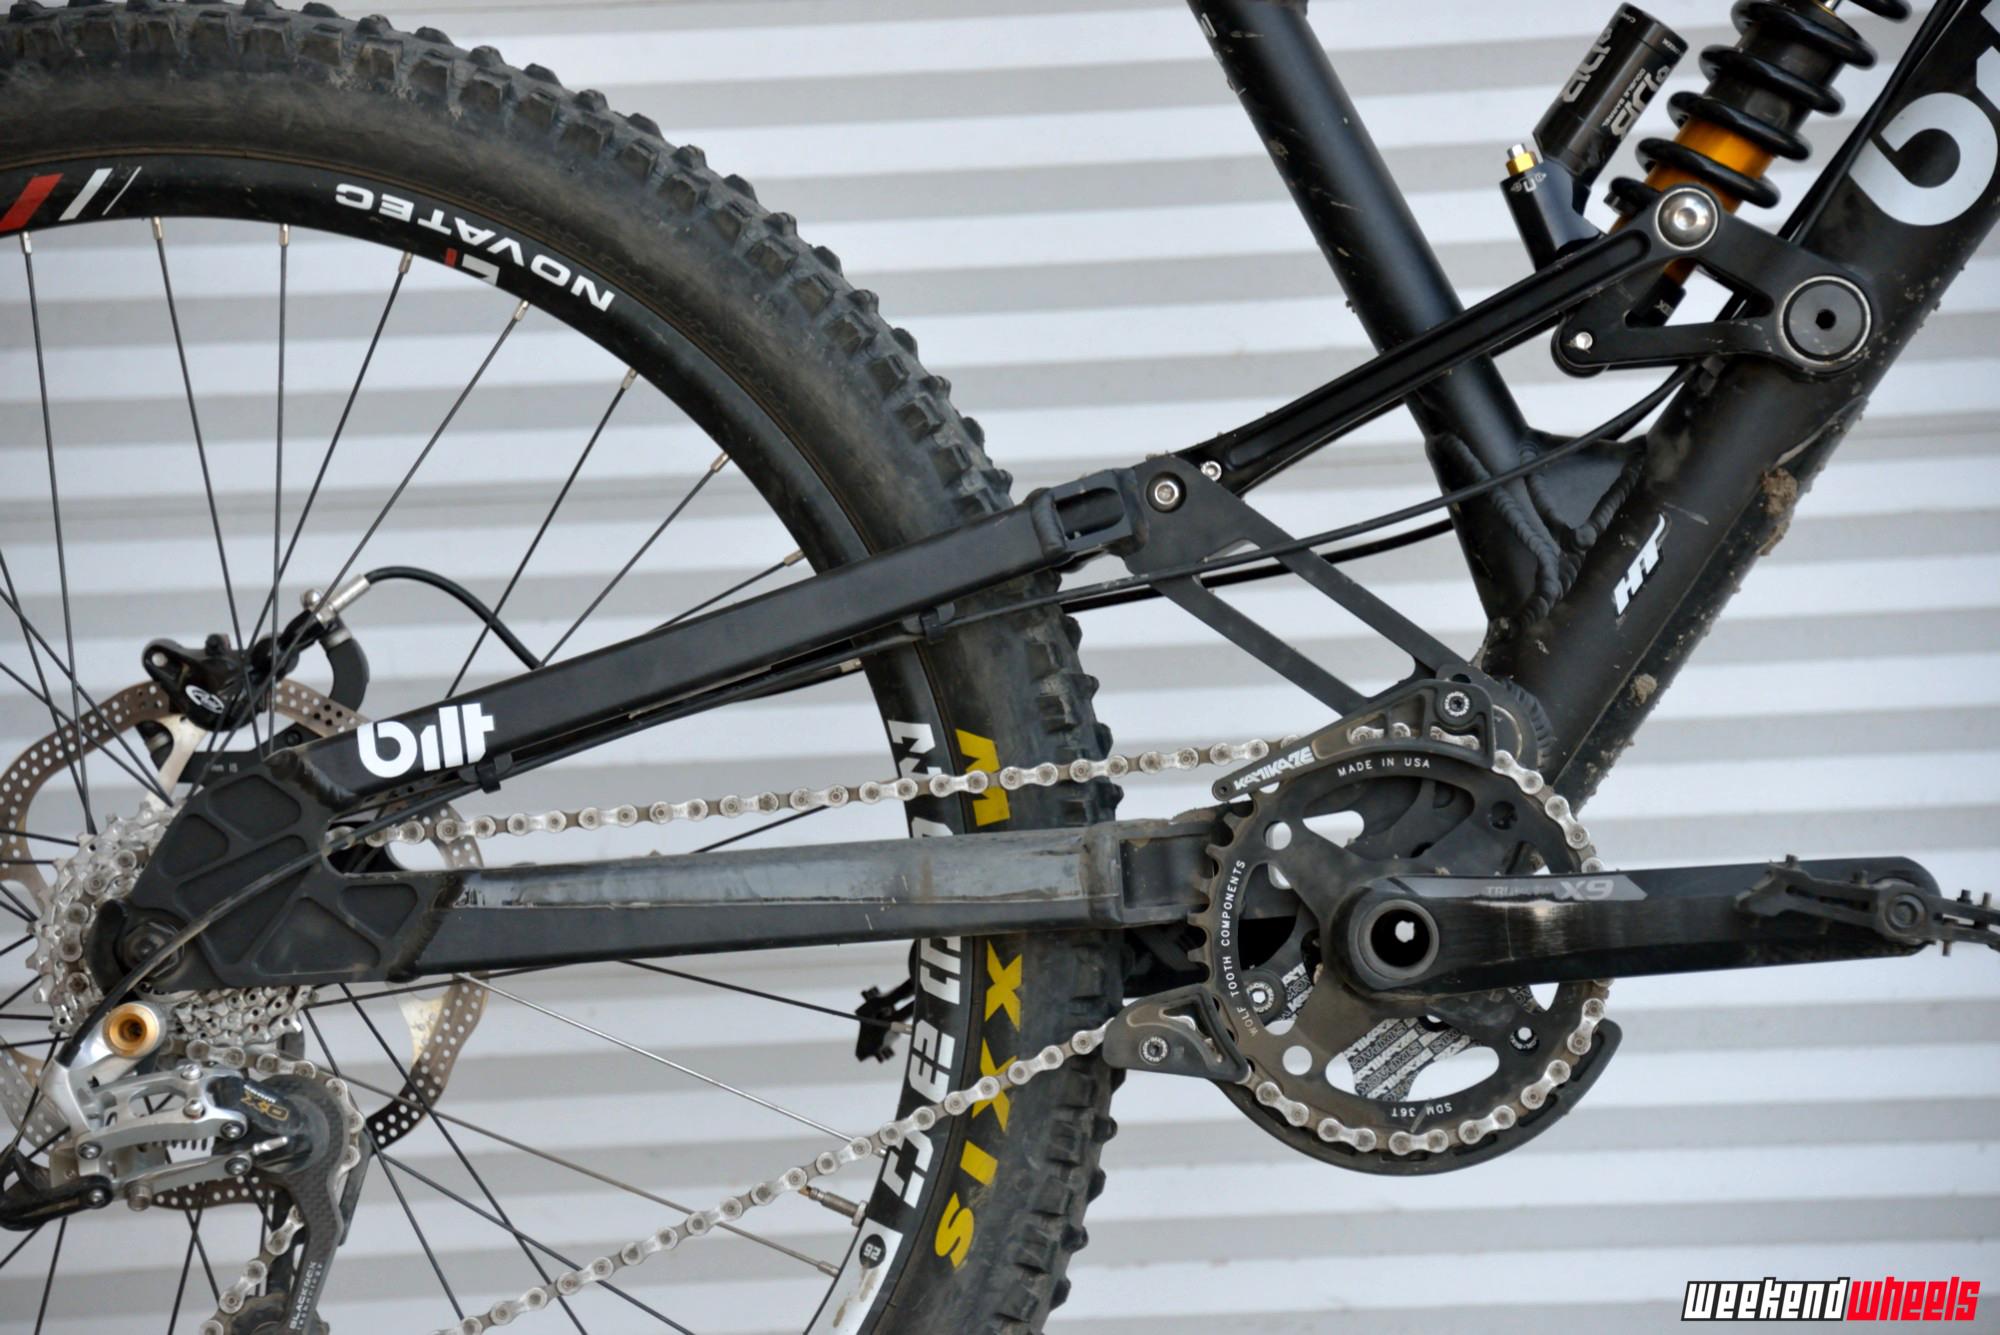 bilt_bike_eight_ct_link_carro